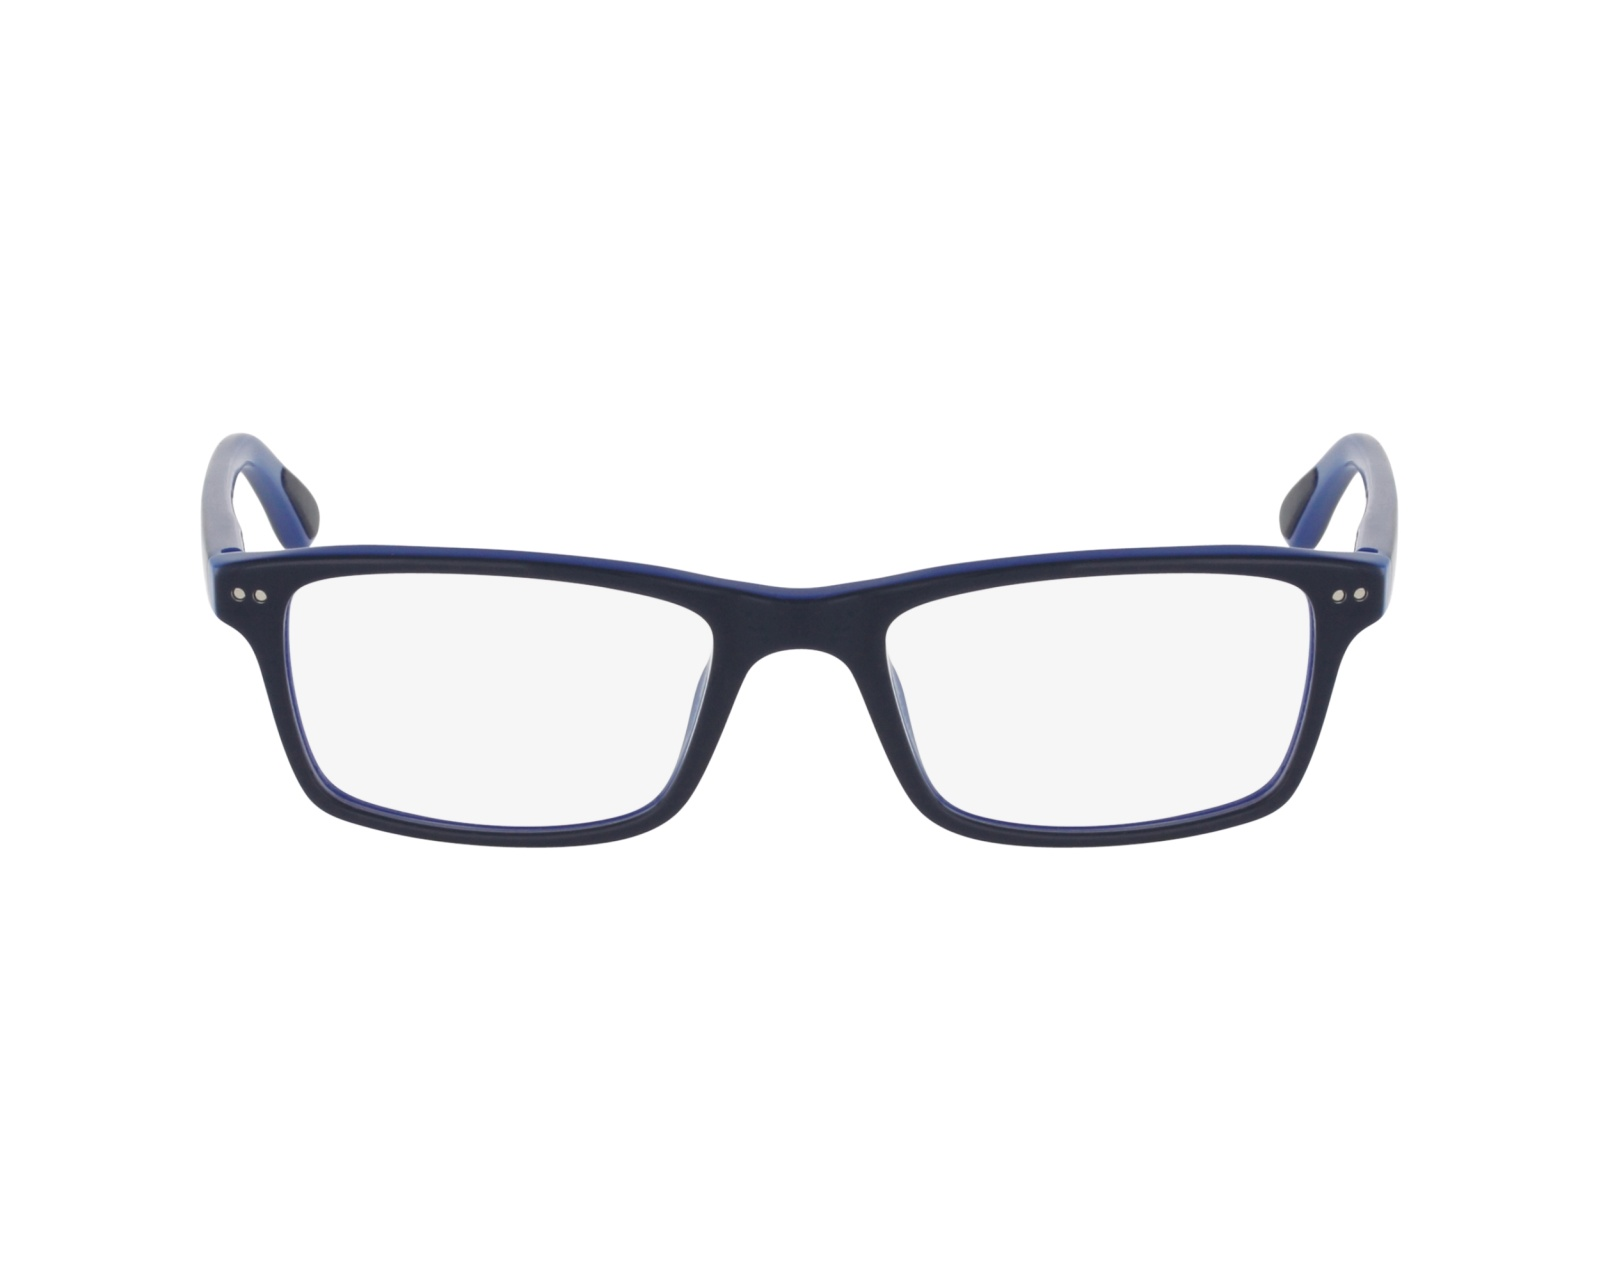 9703988246 eyeglasses Ray-Ban RX-5288 5137 - Blue profile view